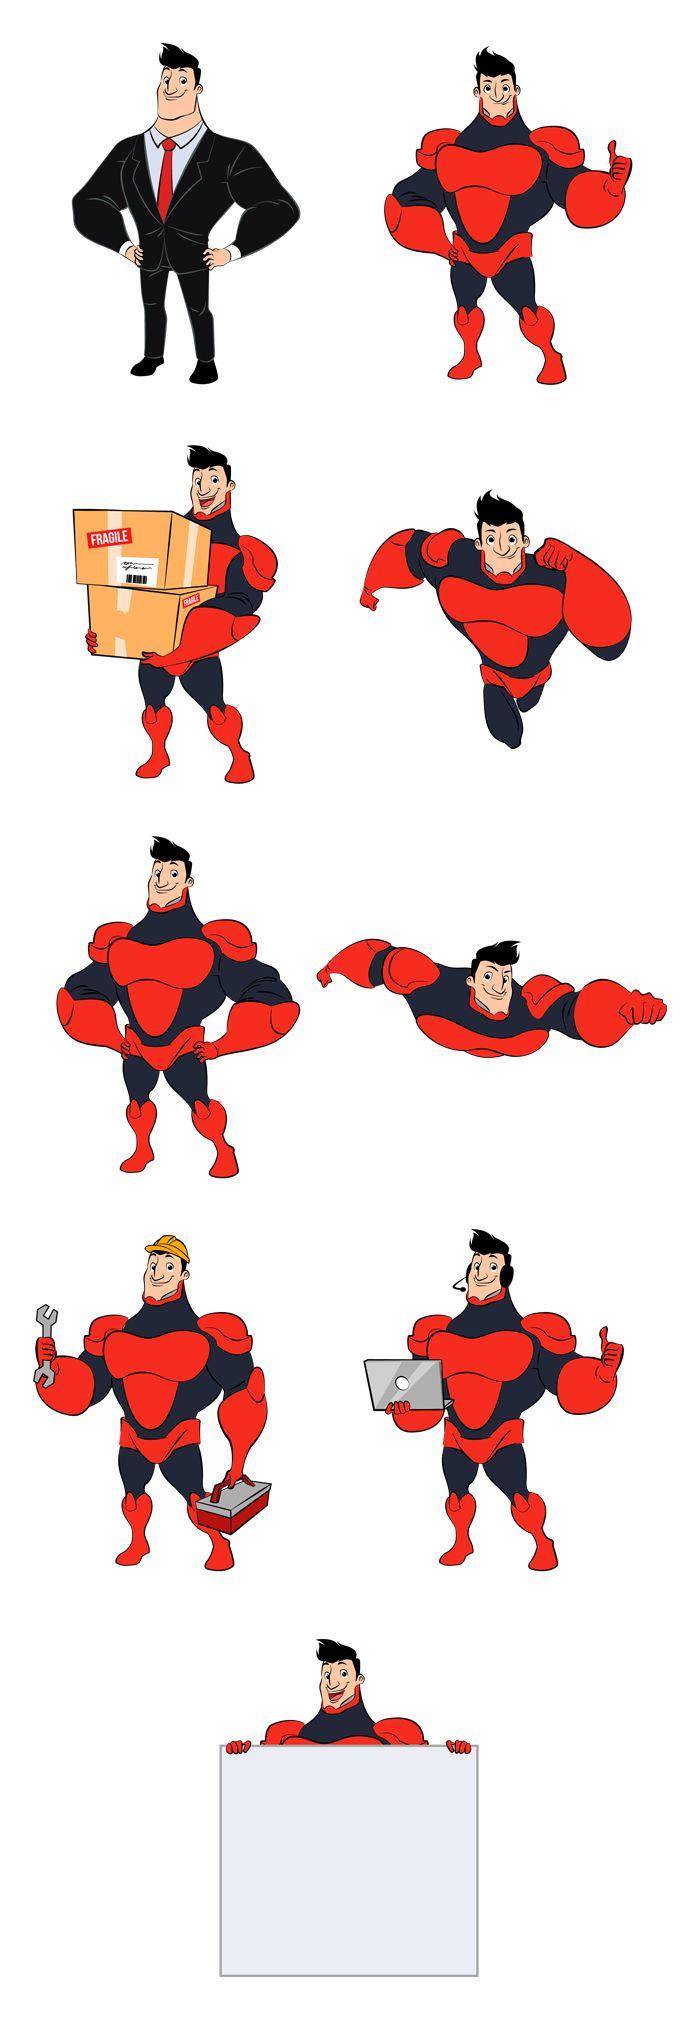 Superhero Illustration Set Ver.1.0 on Behance                                                                                                                                                                                 More